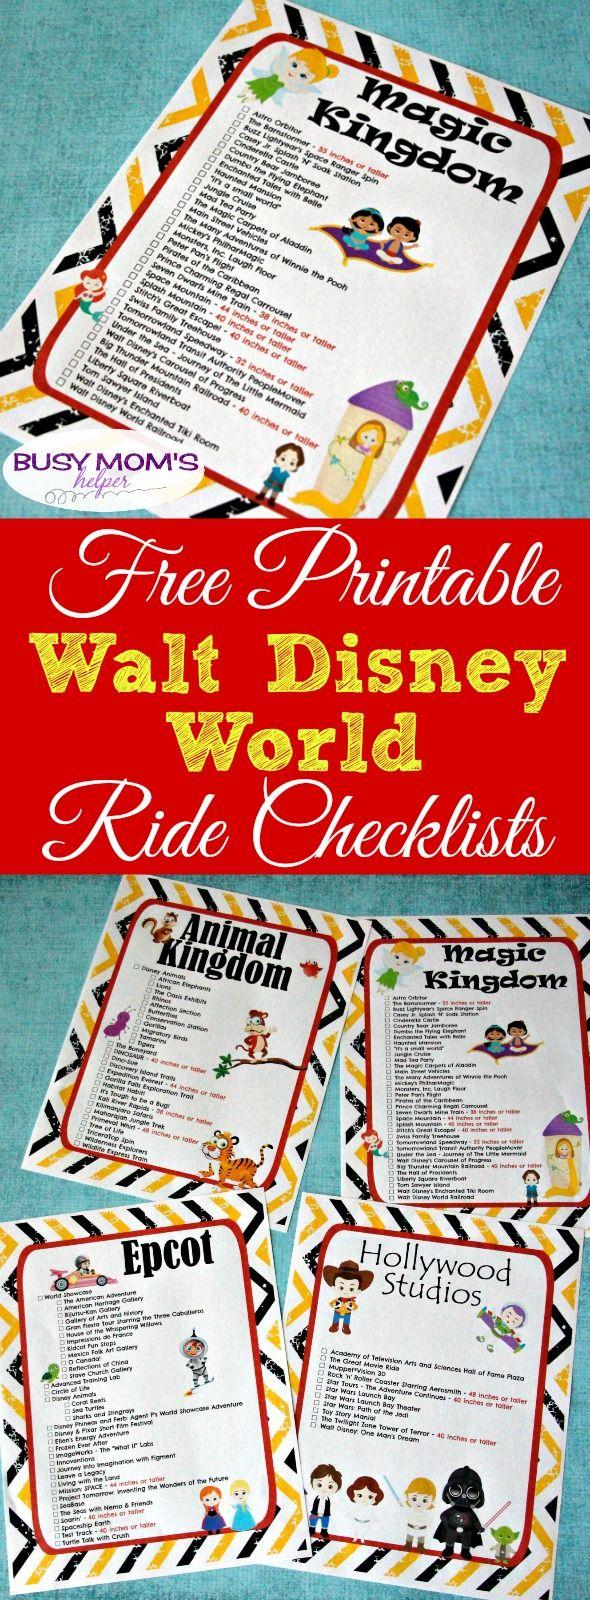 Free Printable Walt Disney World Ride Checklists | Walt